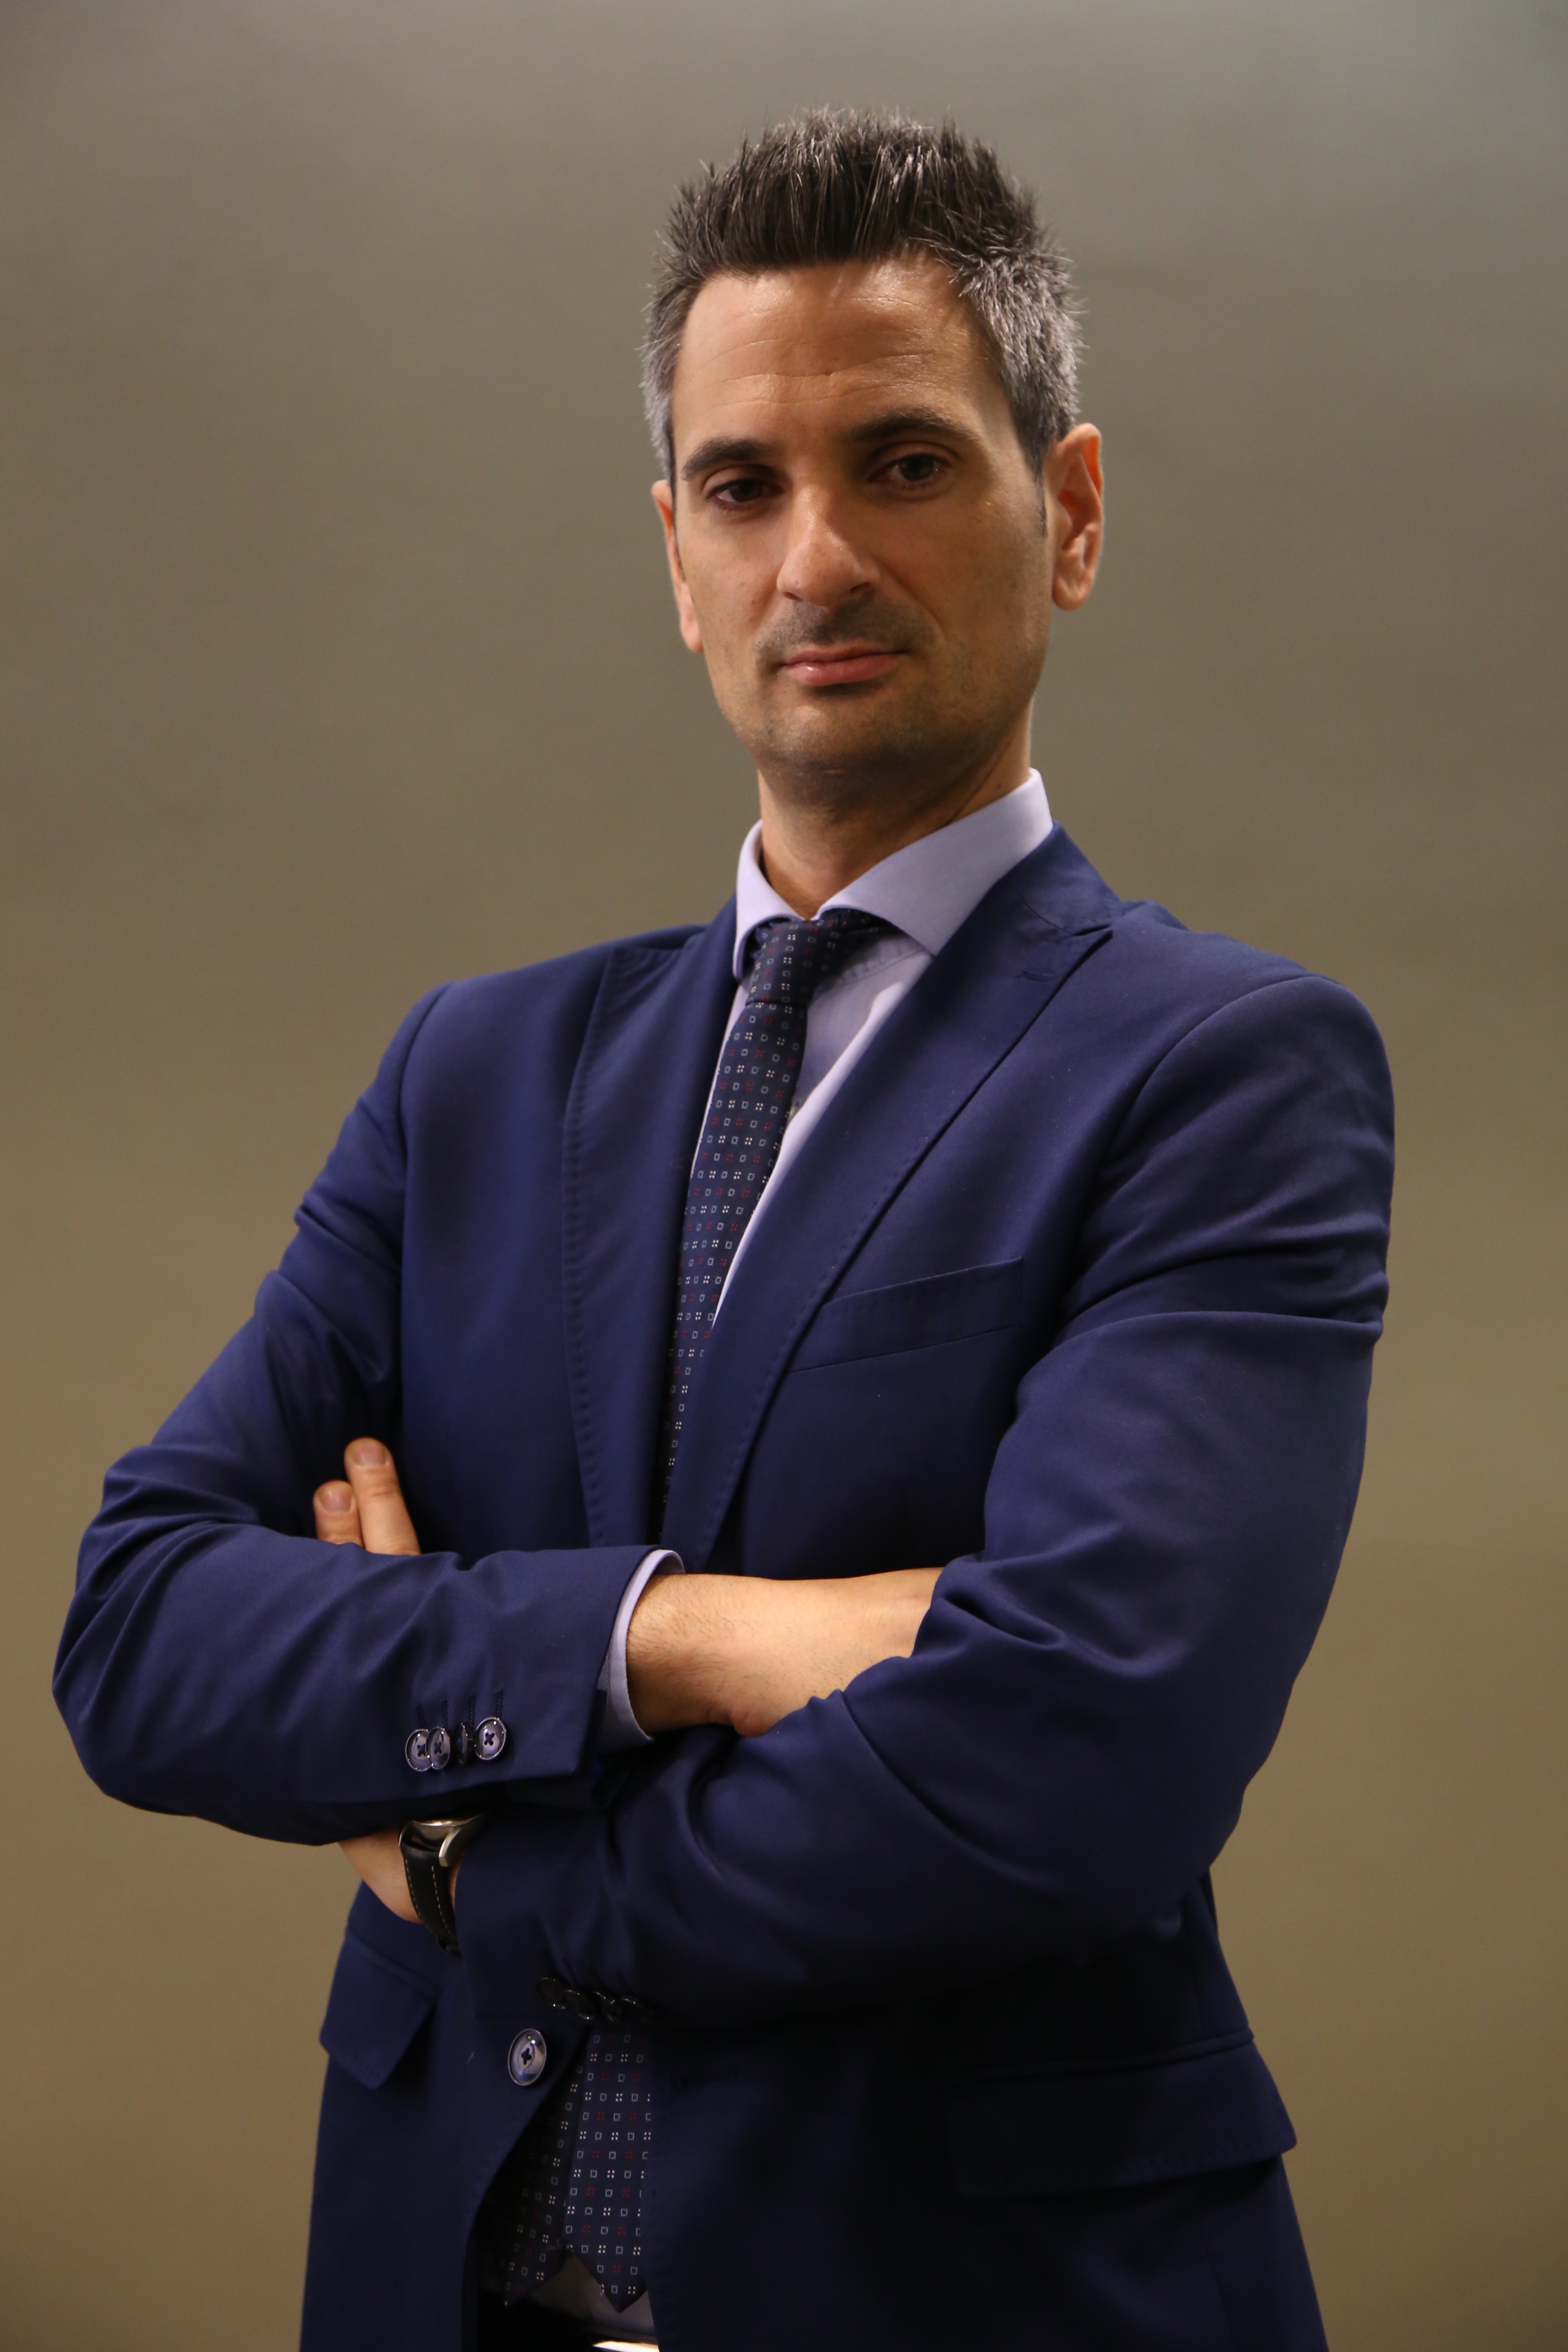 LUKE BRUCATO - Supervision, Risks & Profitability 2019